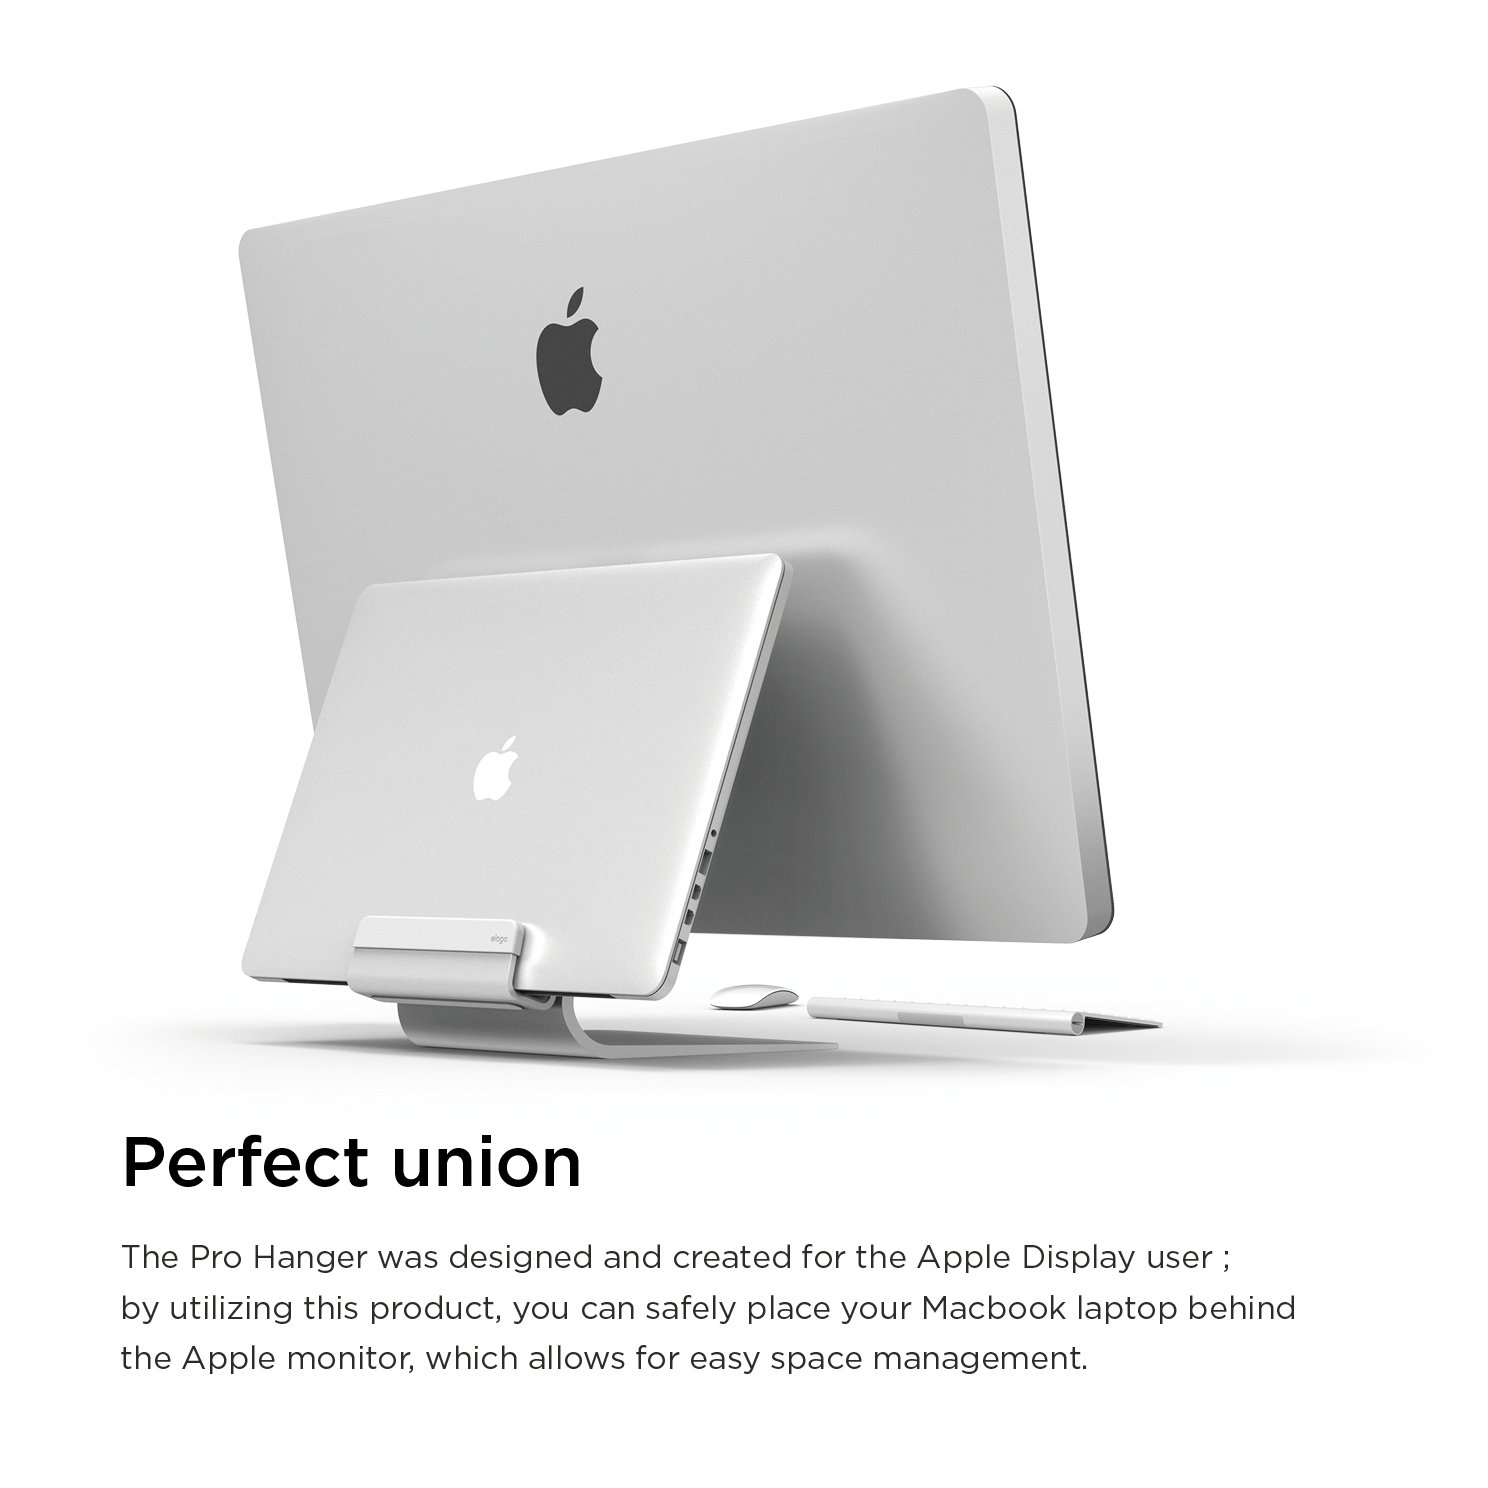 elago Pro Hanger for Mac - Laptop Shelf for iMac, Thunderbolt, and other Apple Displays by elago (Image #2)